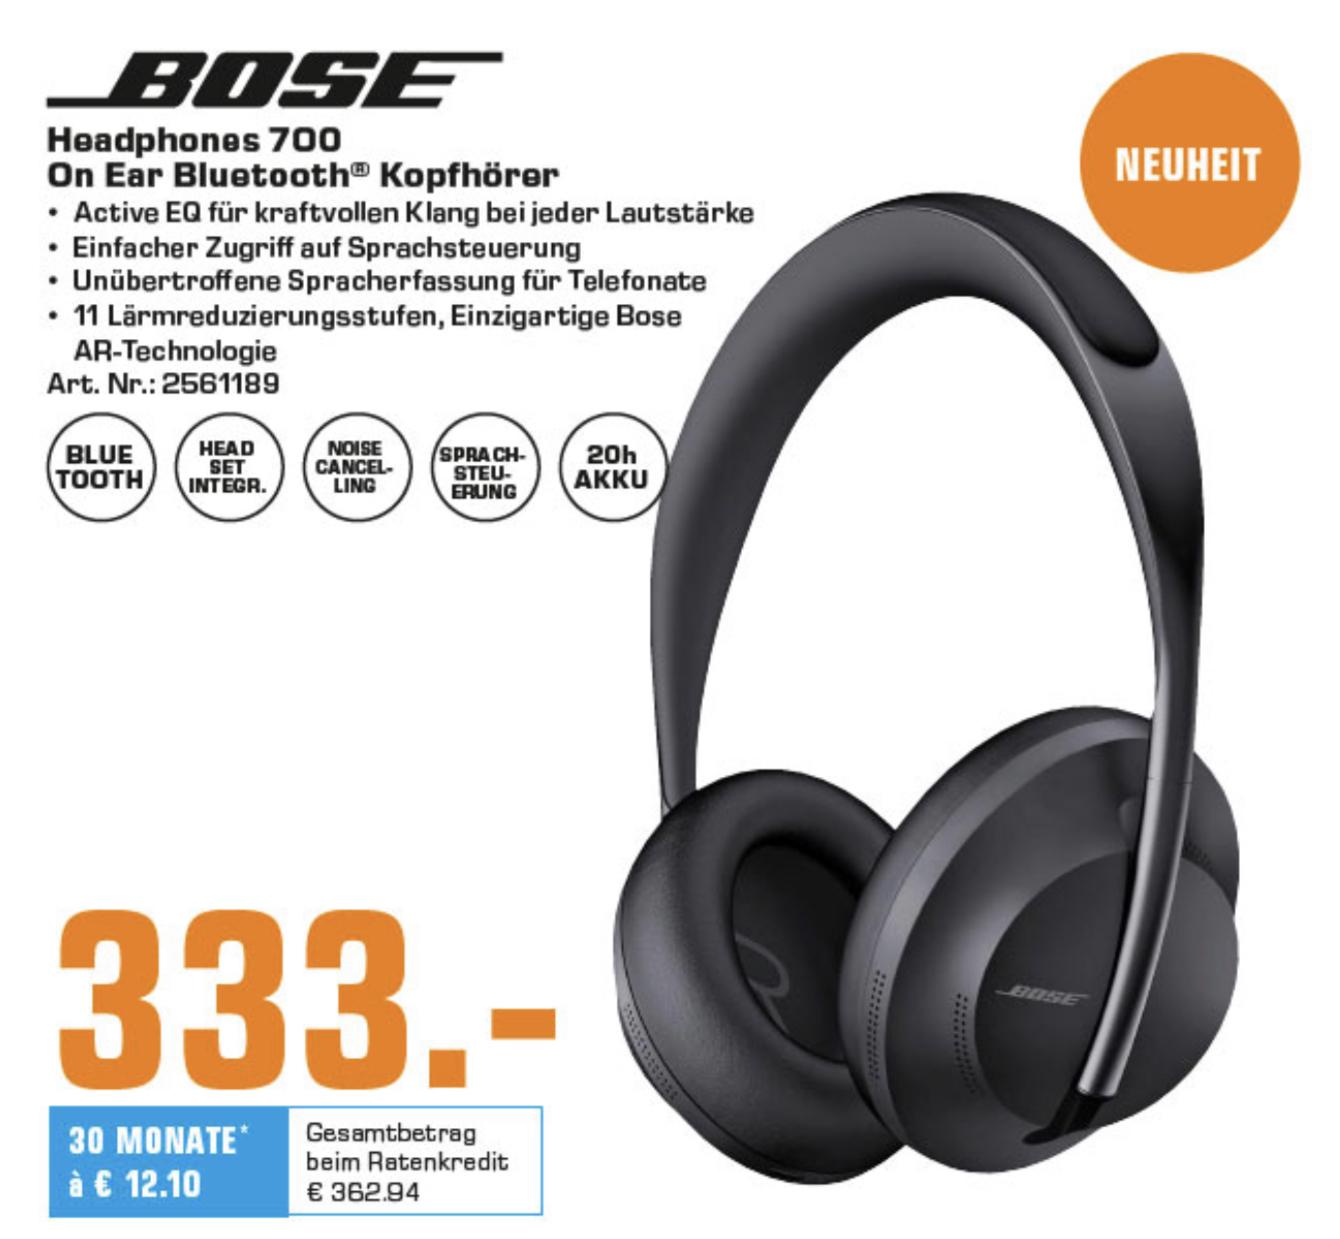 Lokal Saturn Frankfurt/Main usw.: Bose Noise Cancelling Headphones 700 -neues Modell- für 333€